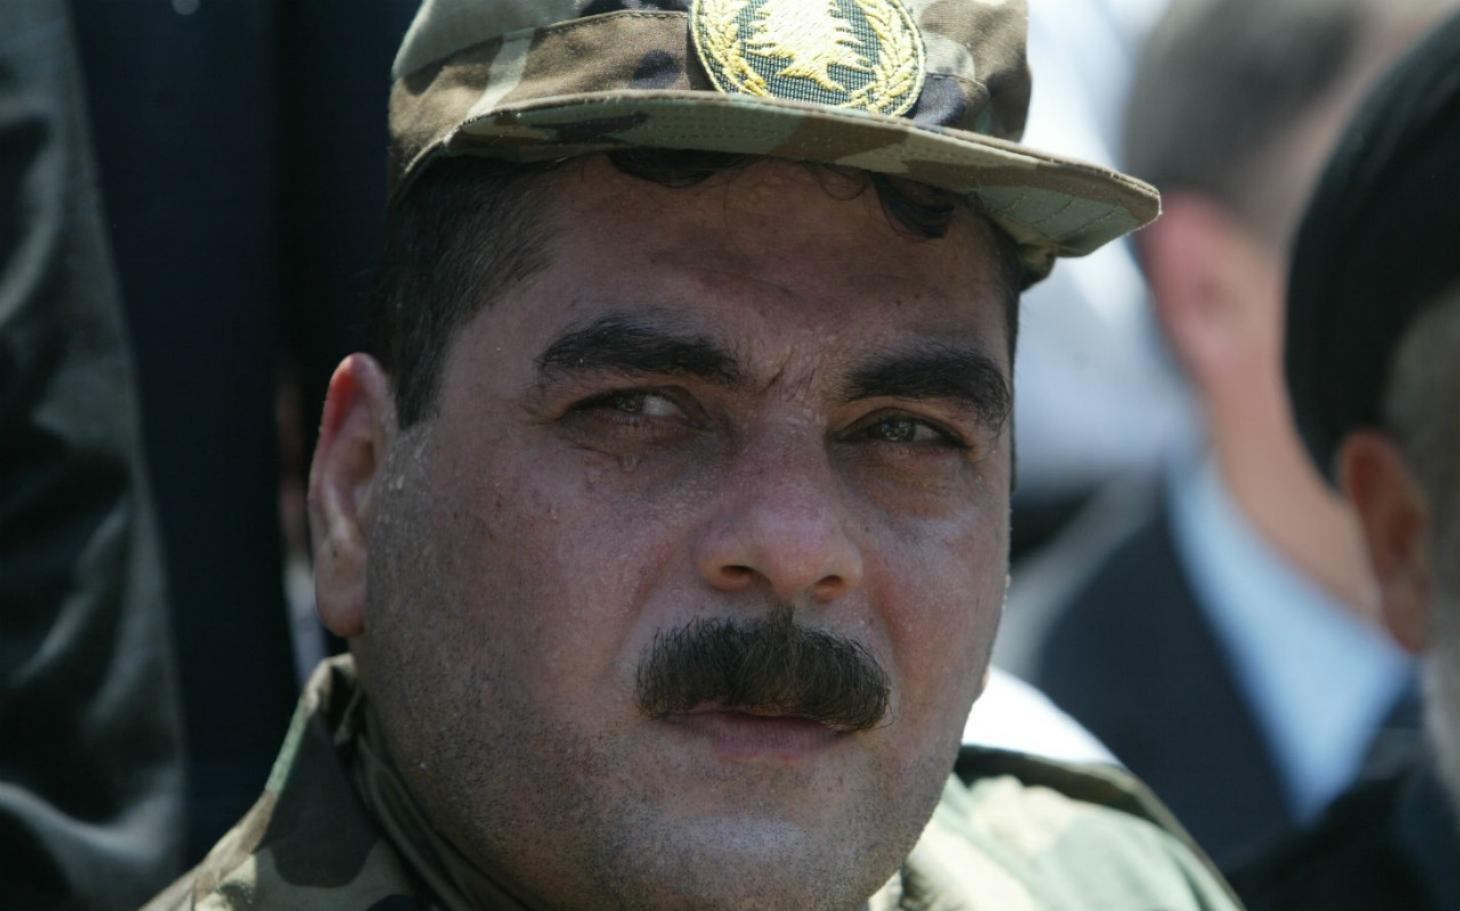 hezbollah leader killed in syria